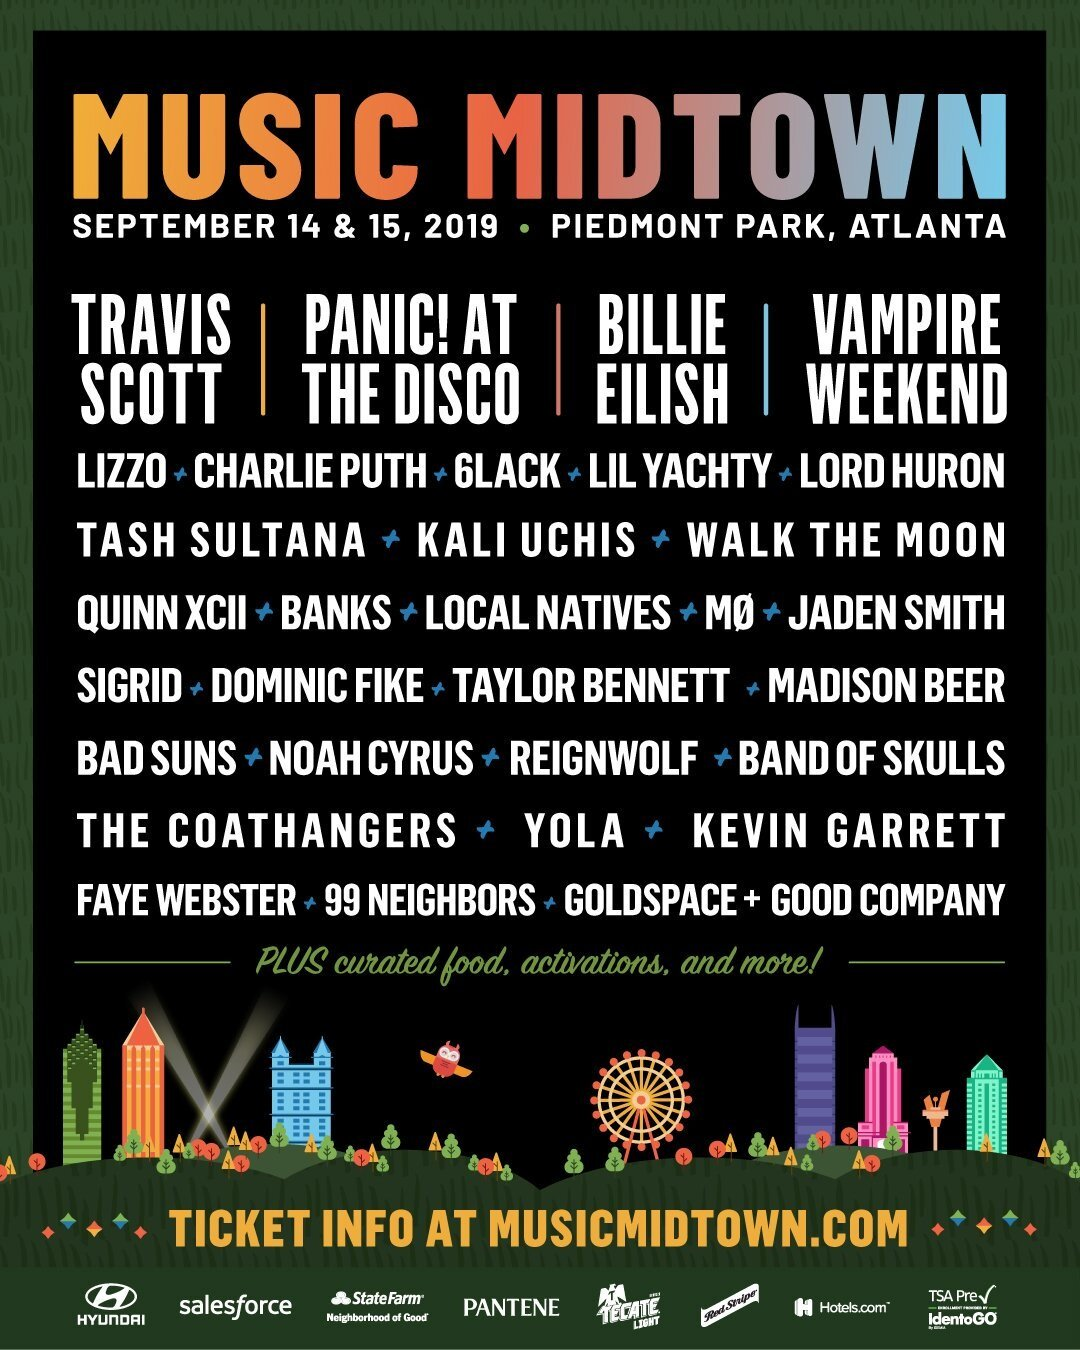 music-midtown-2019-lineup-poster.jpg